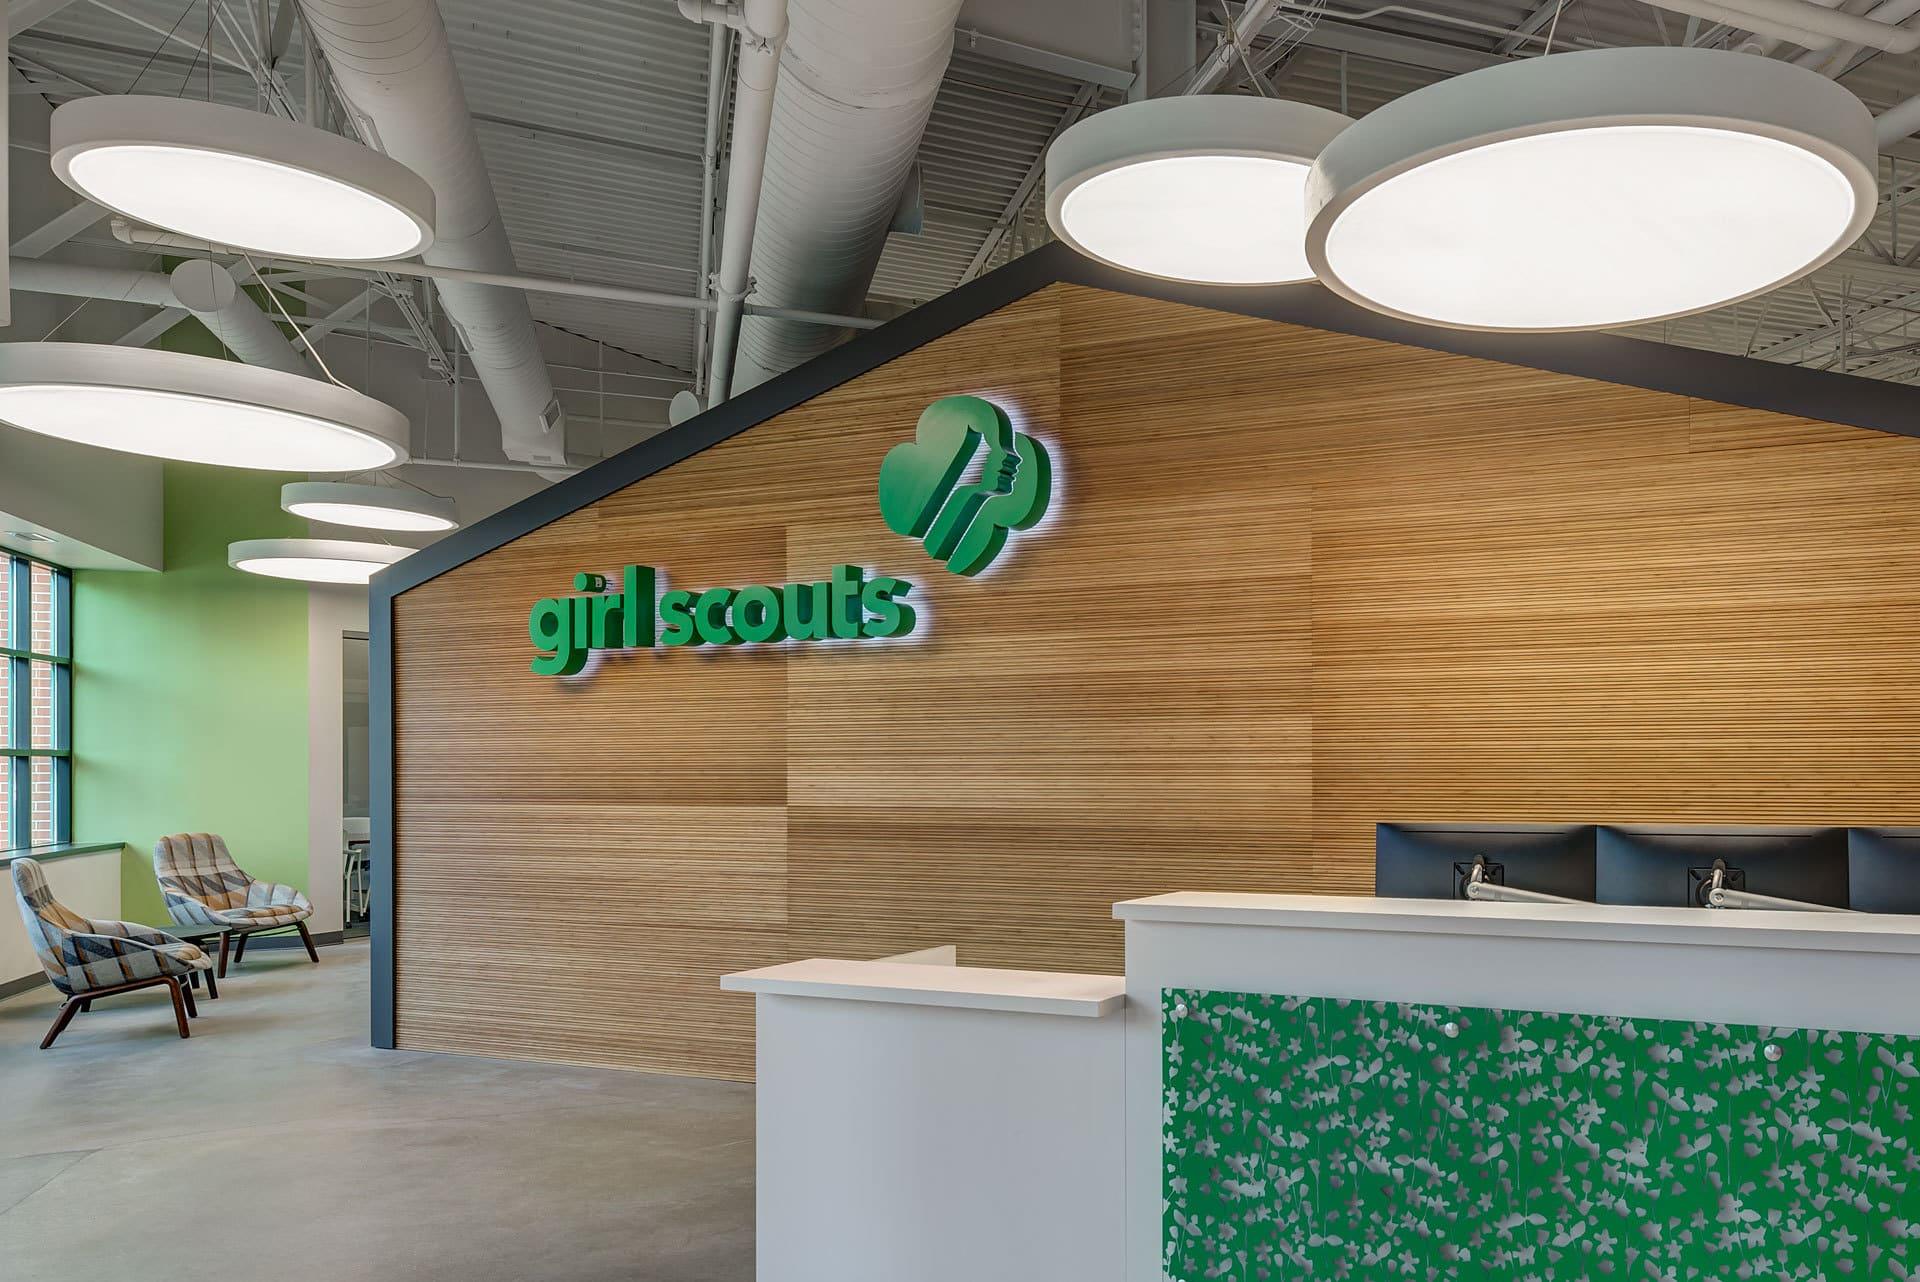 Girl Scouts of Southeastern Michigan Corporate - Davis & Davis Interior Design